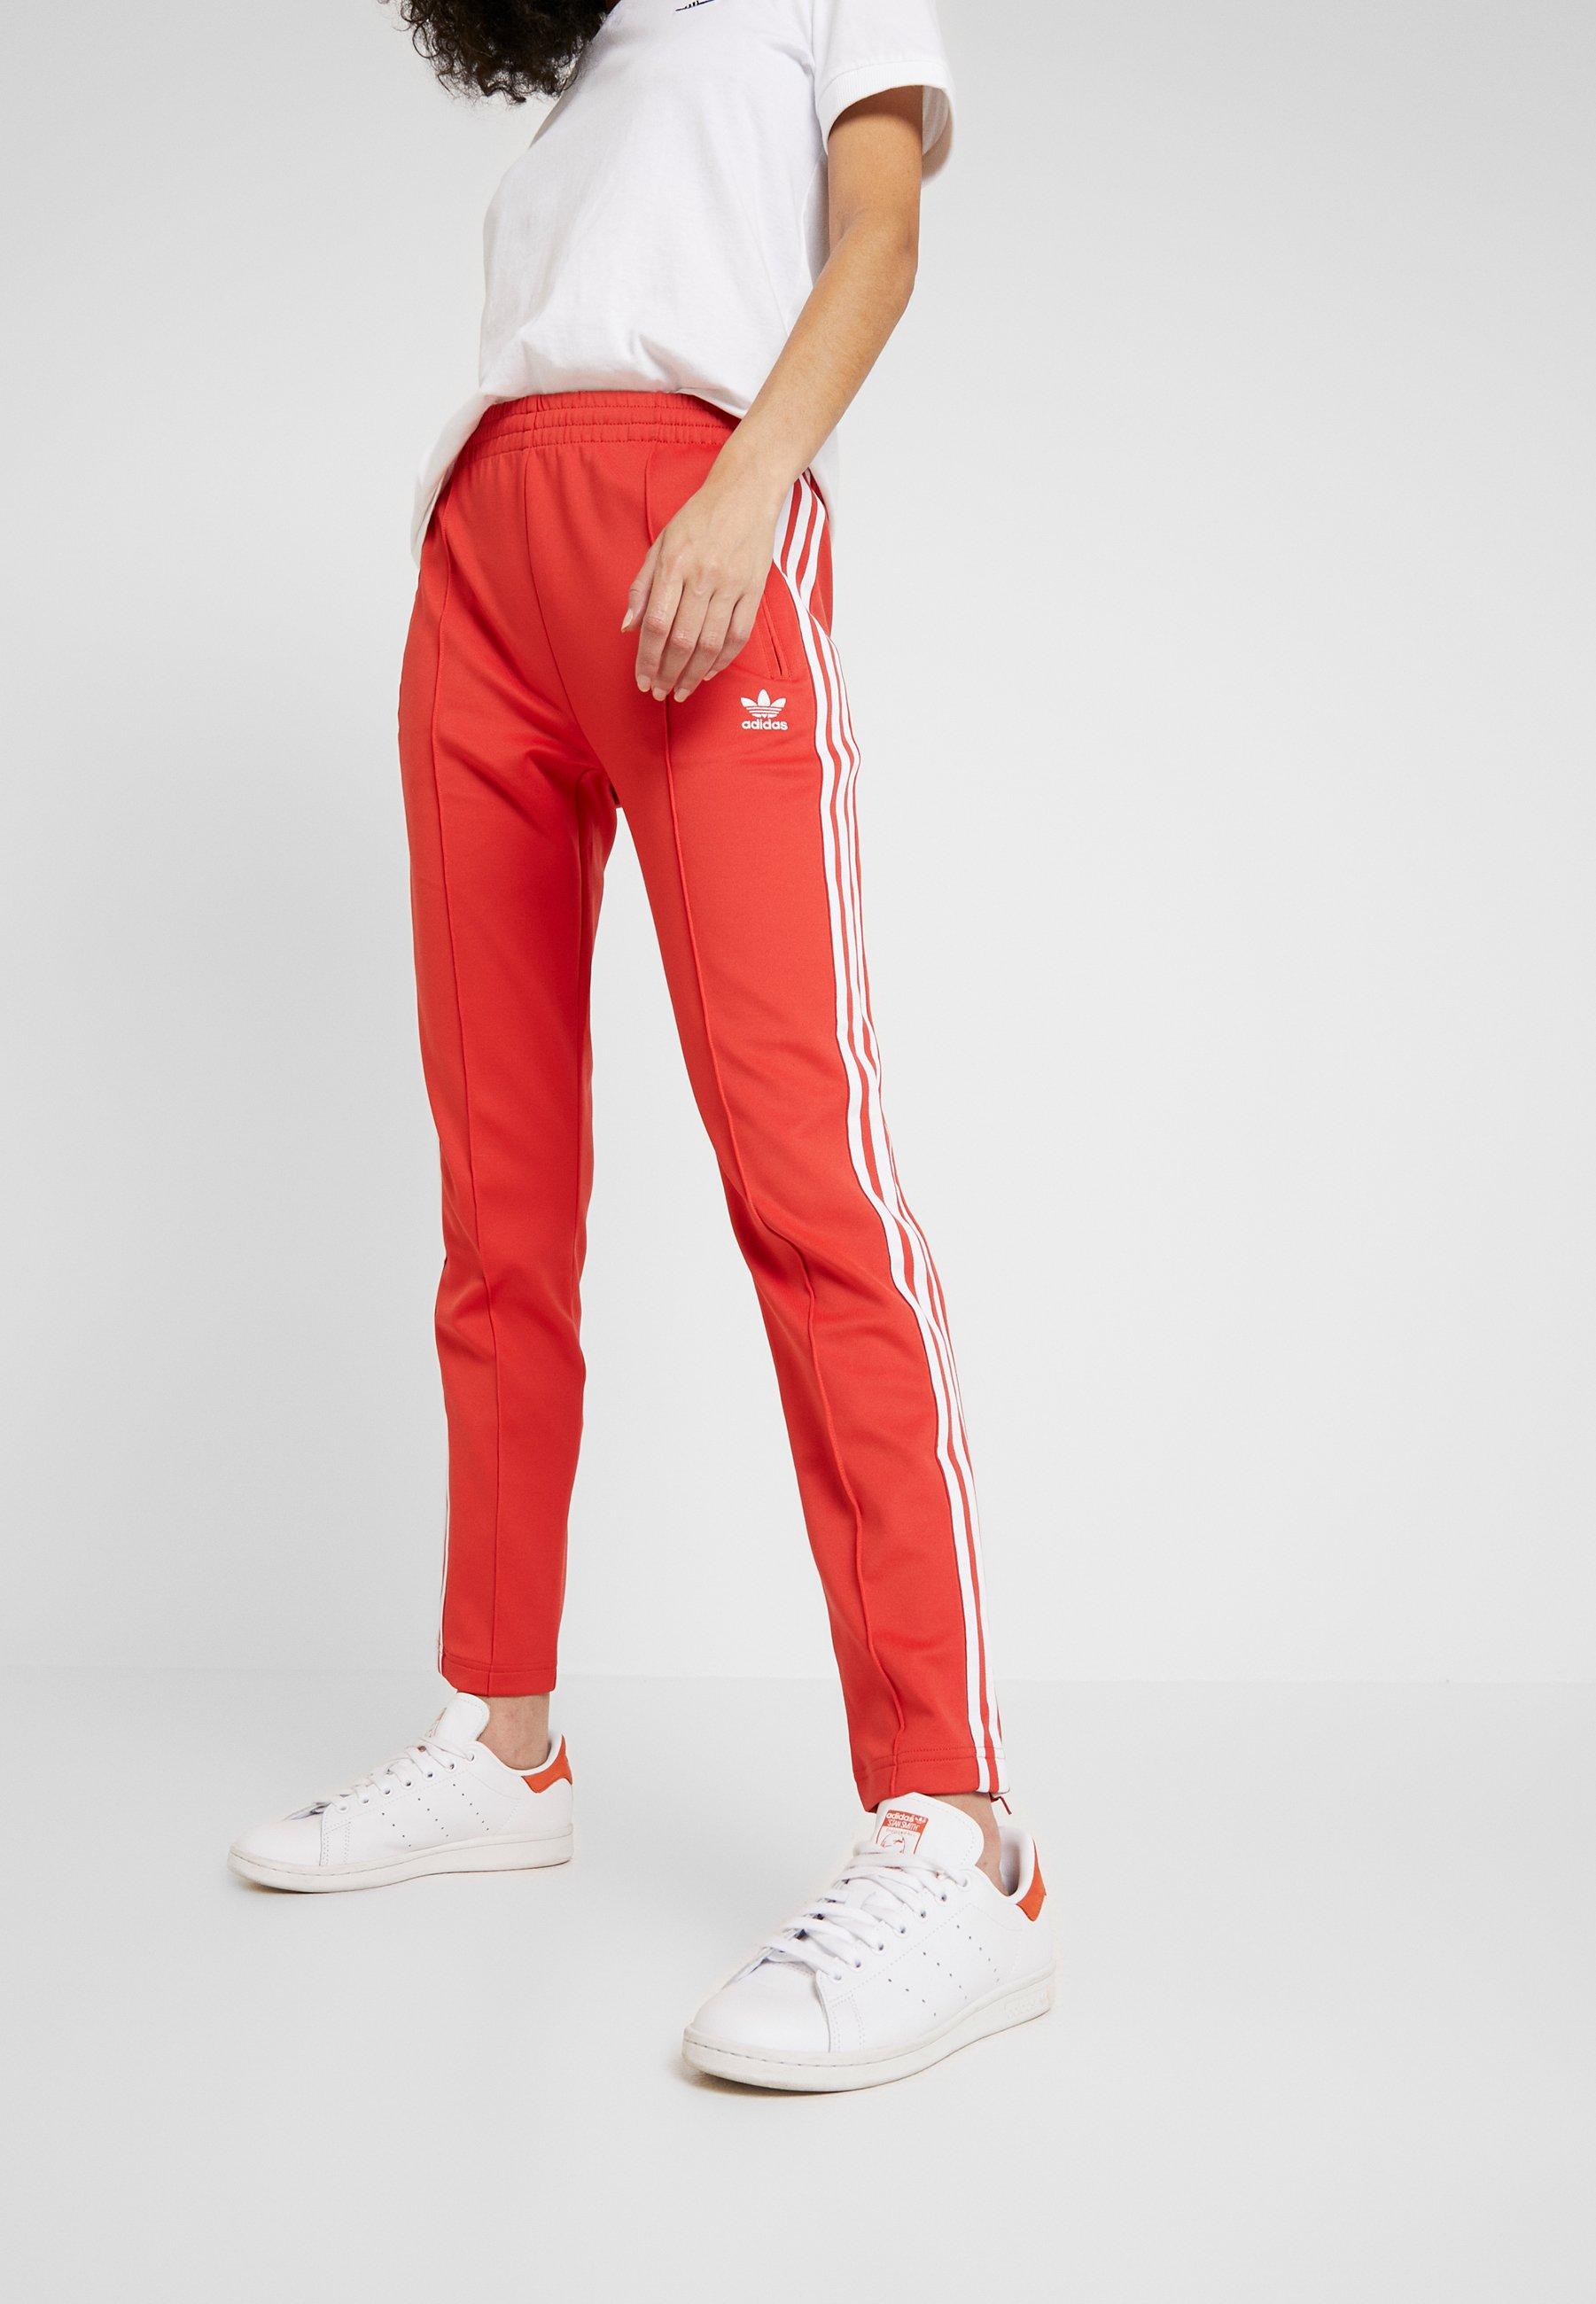 adidas Originals Spodnie treningowe - lush red/white